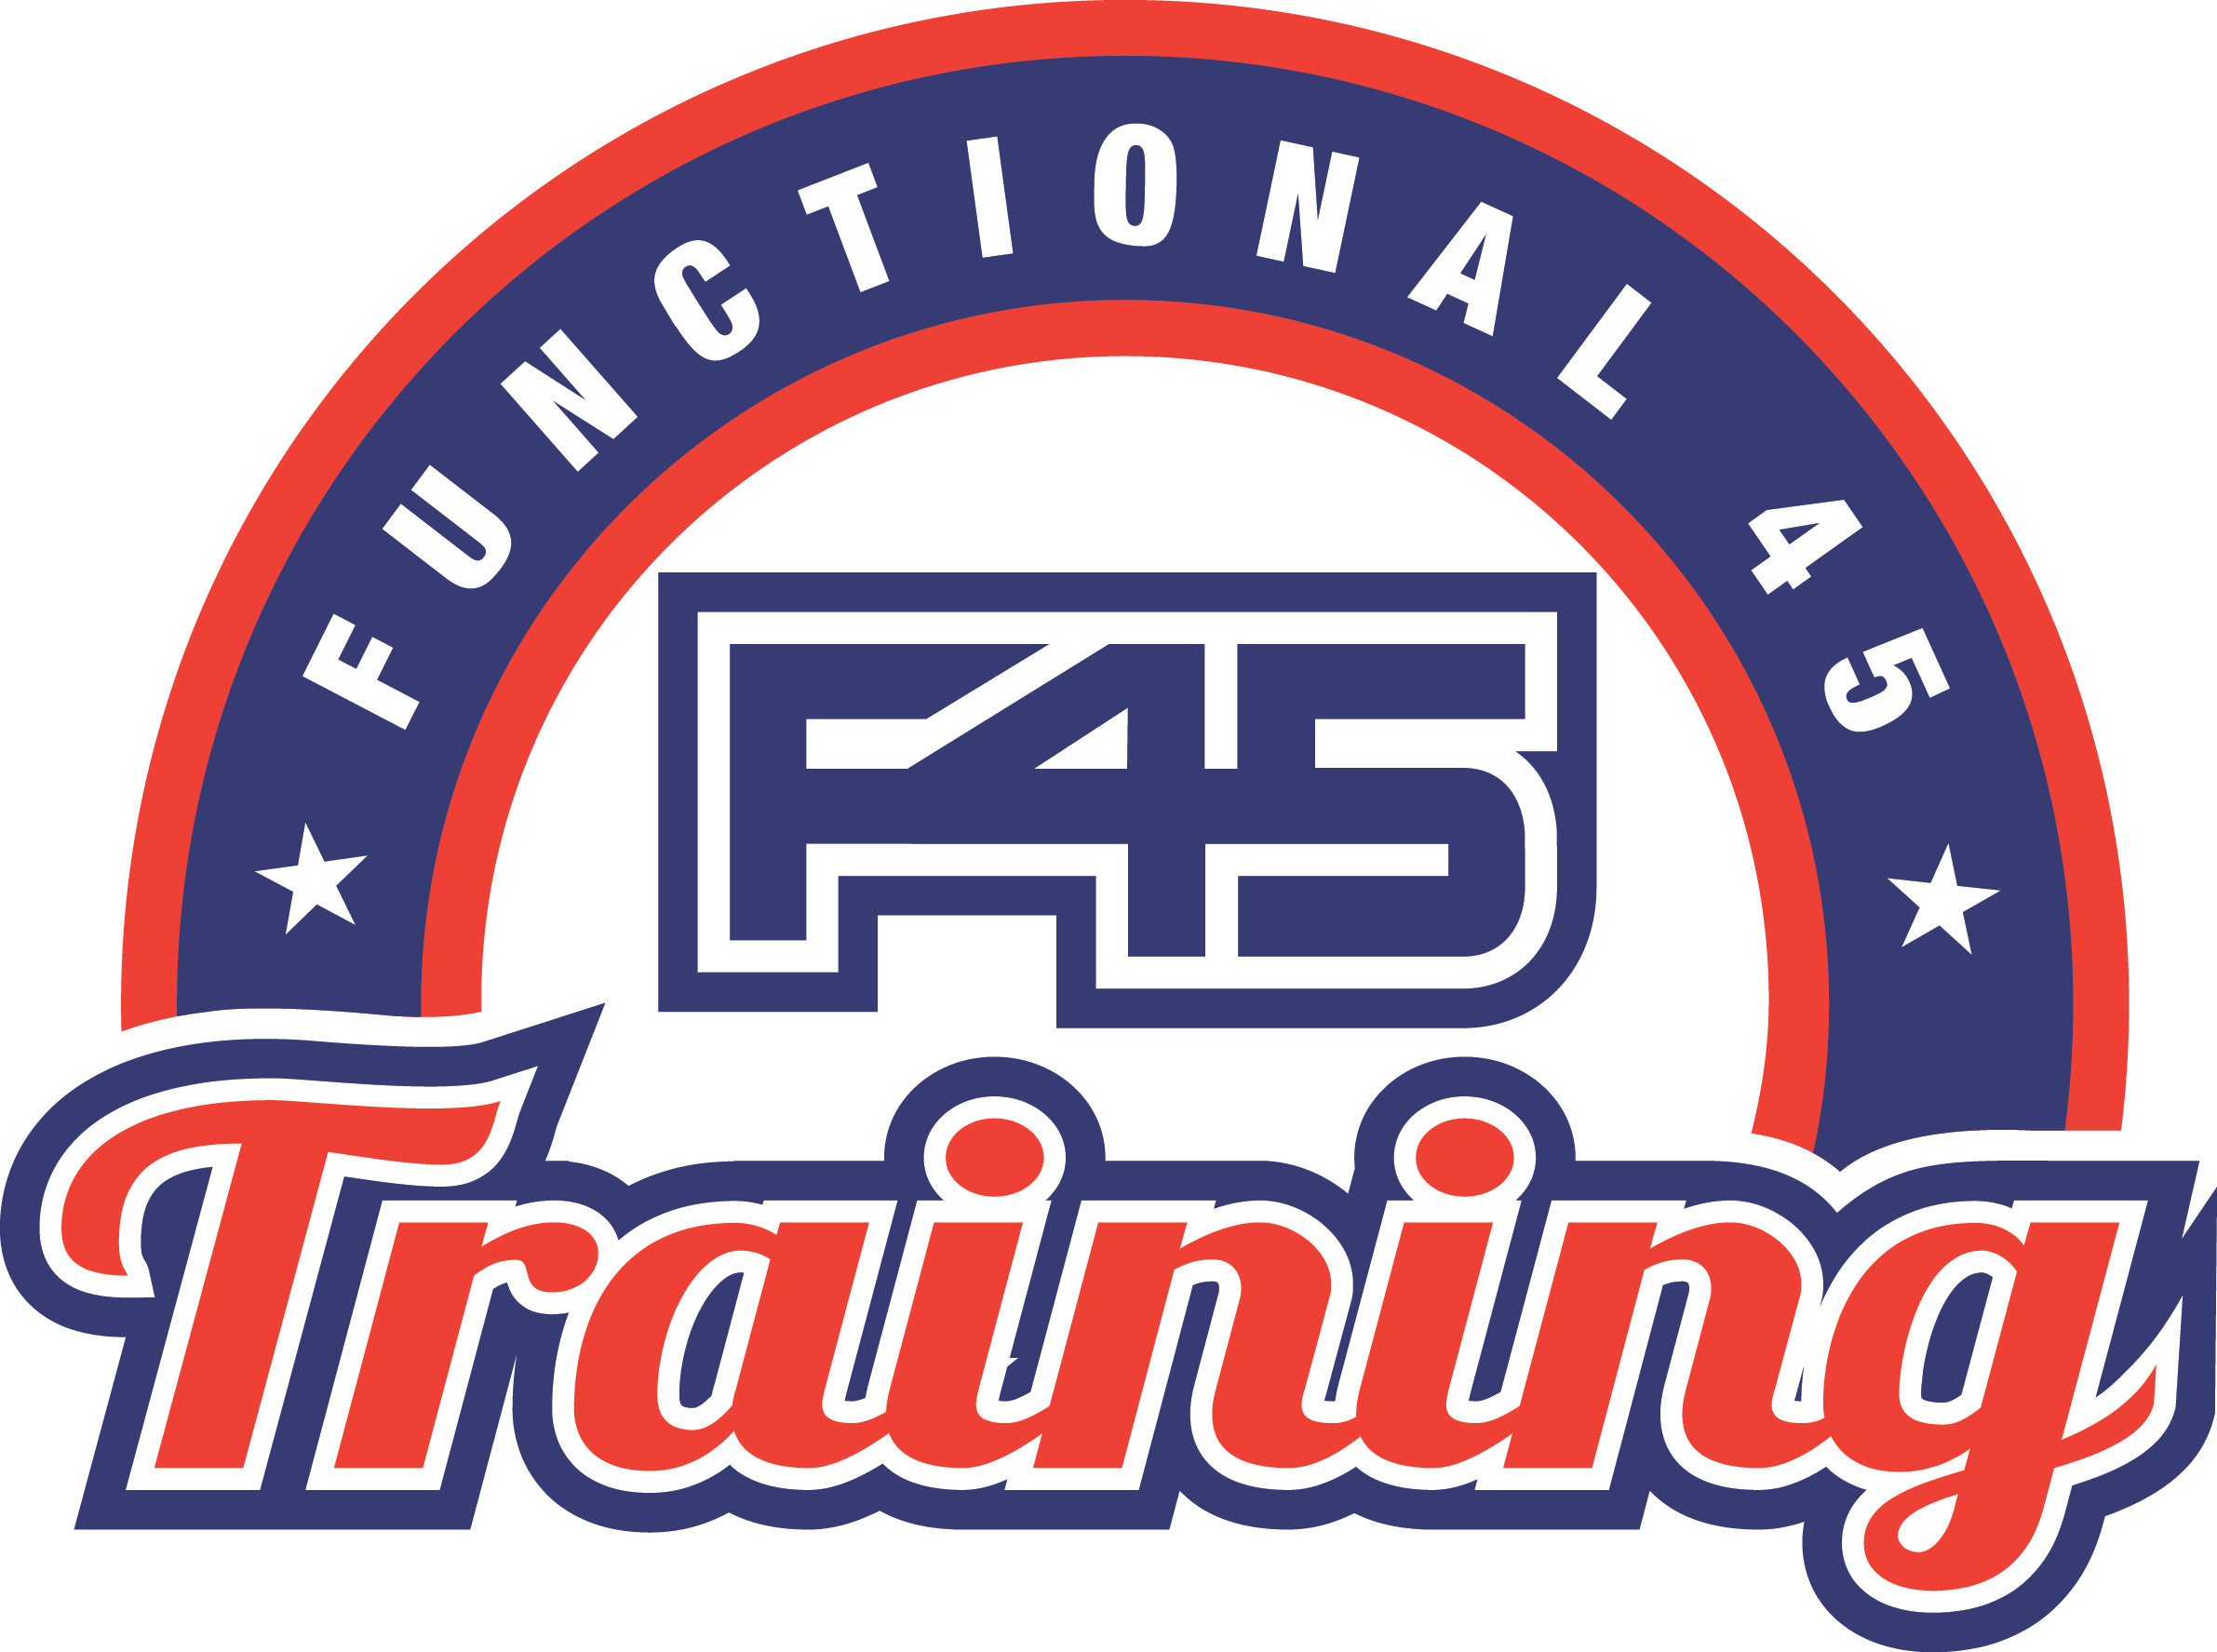 Functional 45 Training